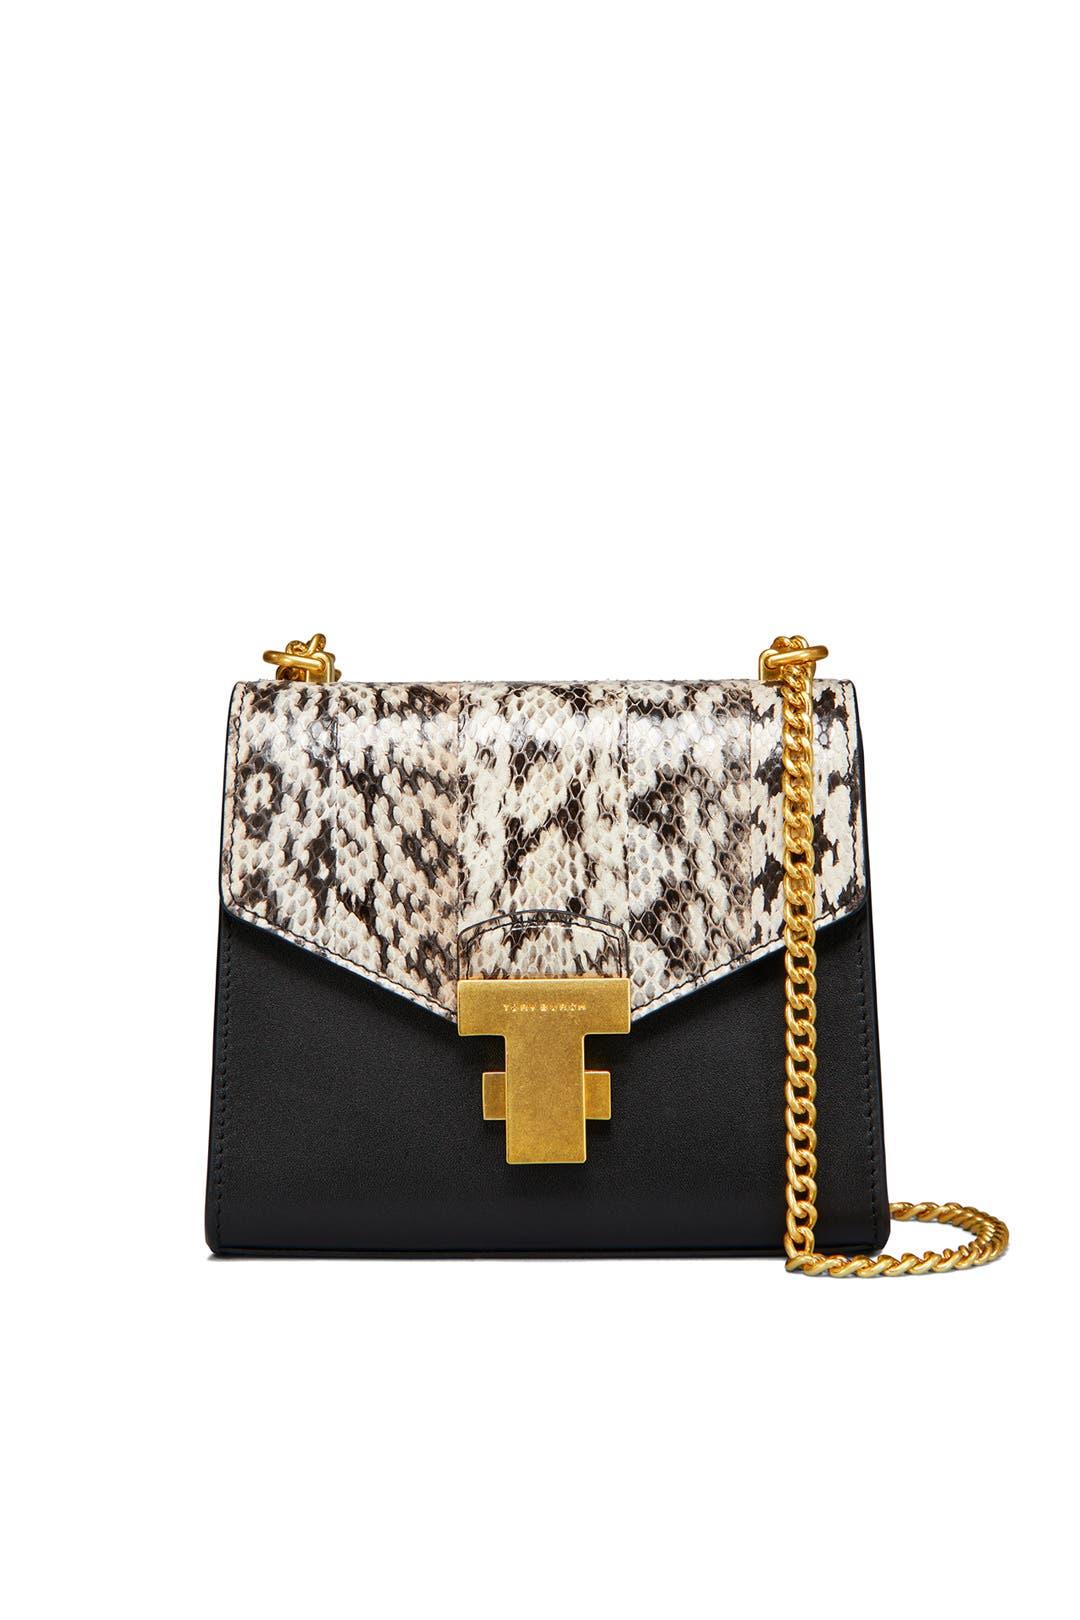 db8caa18bd8cc Tory Burch Accessories. Read Reviews. Juliette Exotic Mini Bag